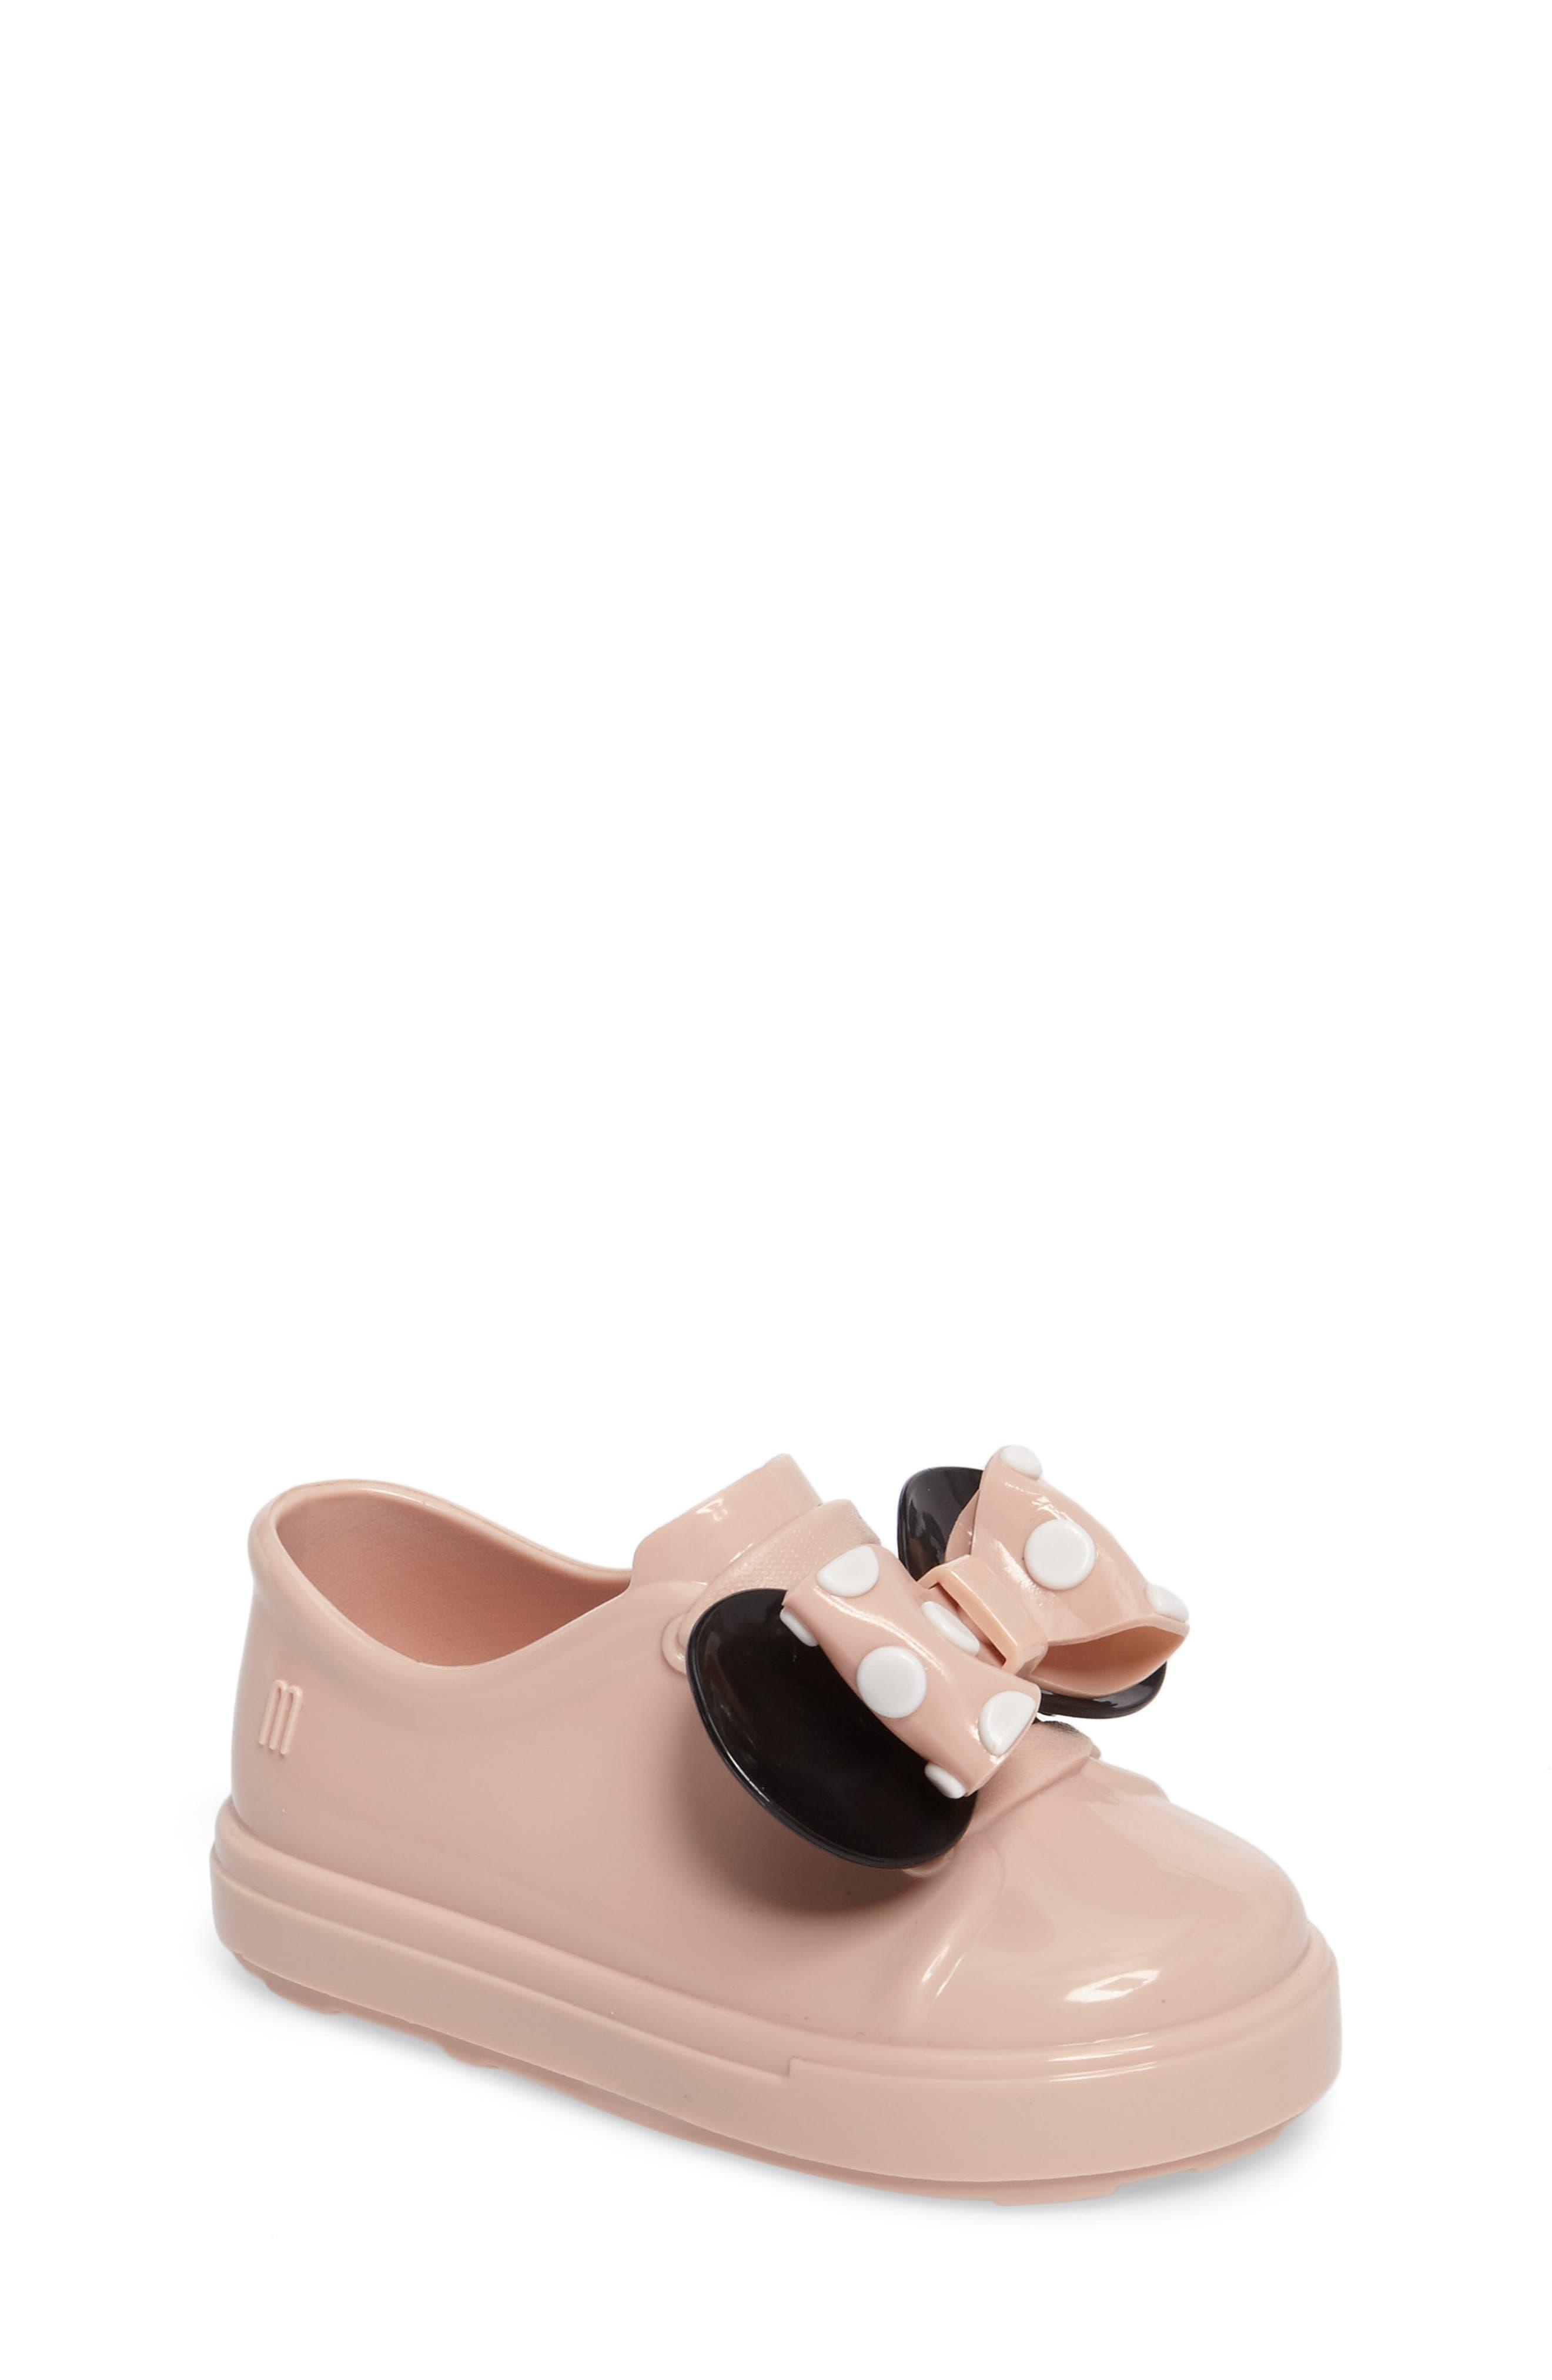 Alternate Image 1 Selected - Mini Melissa Disney® Be Minnie Slip-On Sneaker (Walker & Toddler)